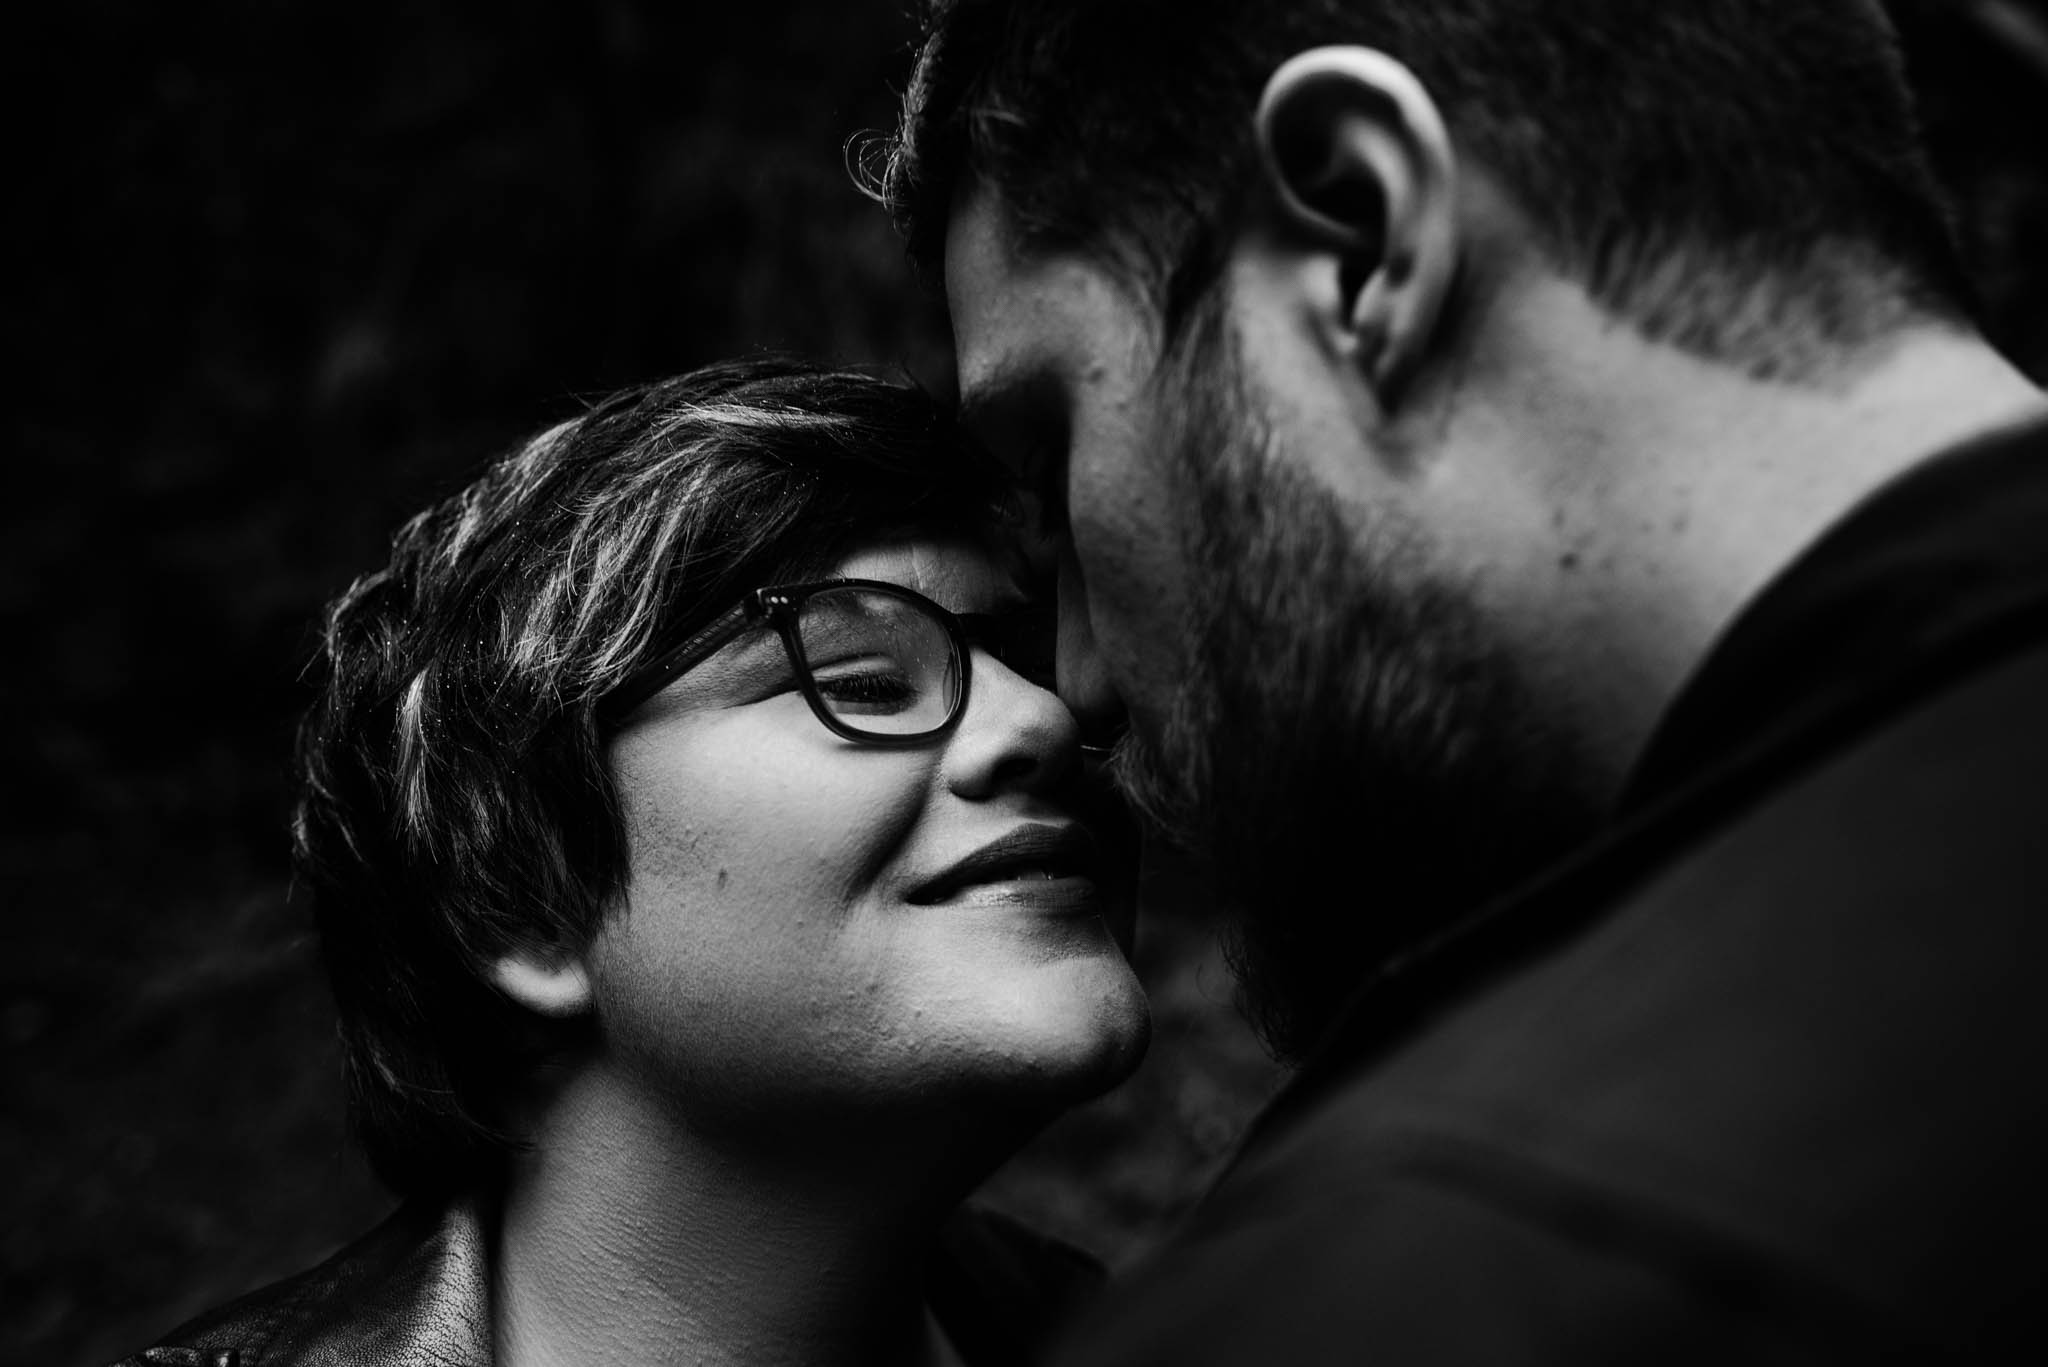 launceston couples photographer-4.jpg